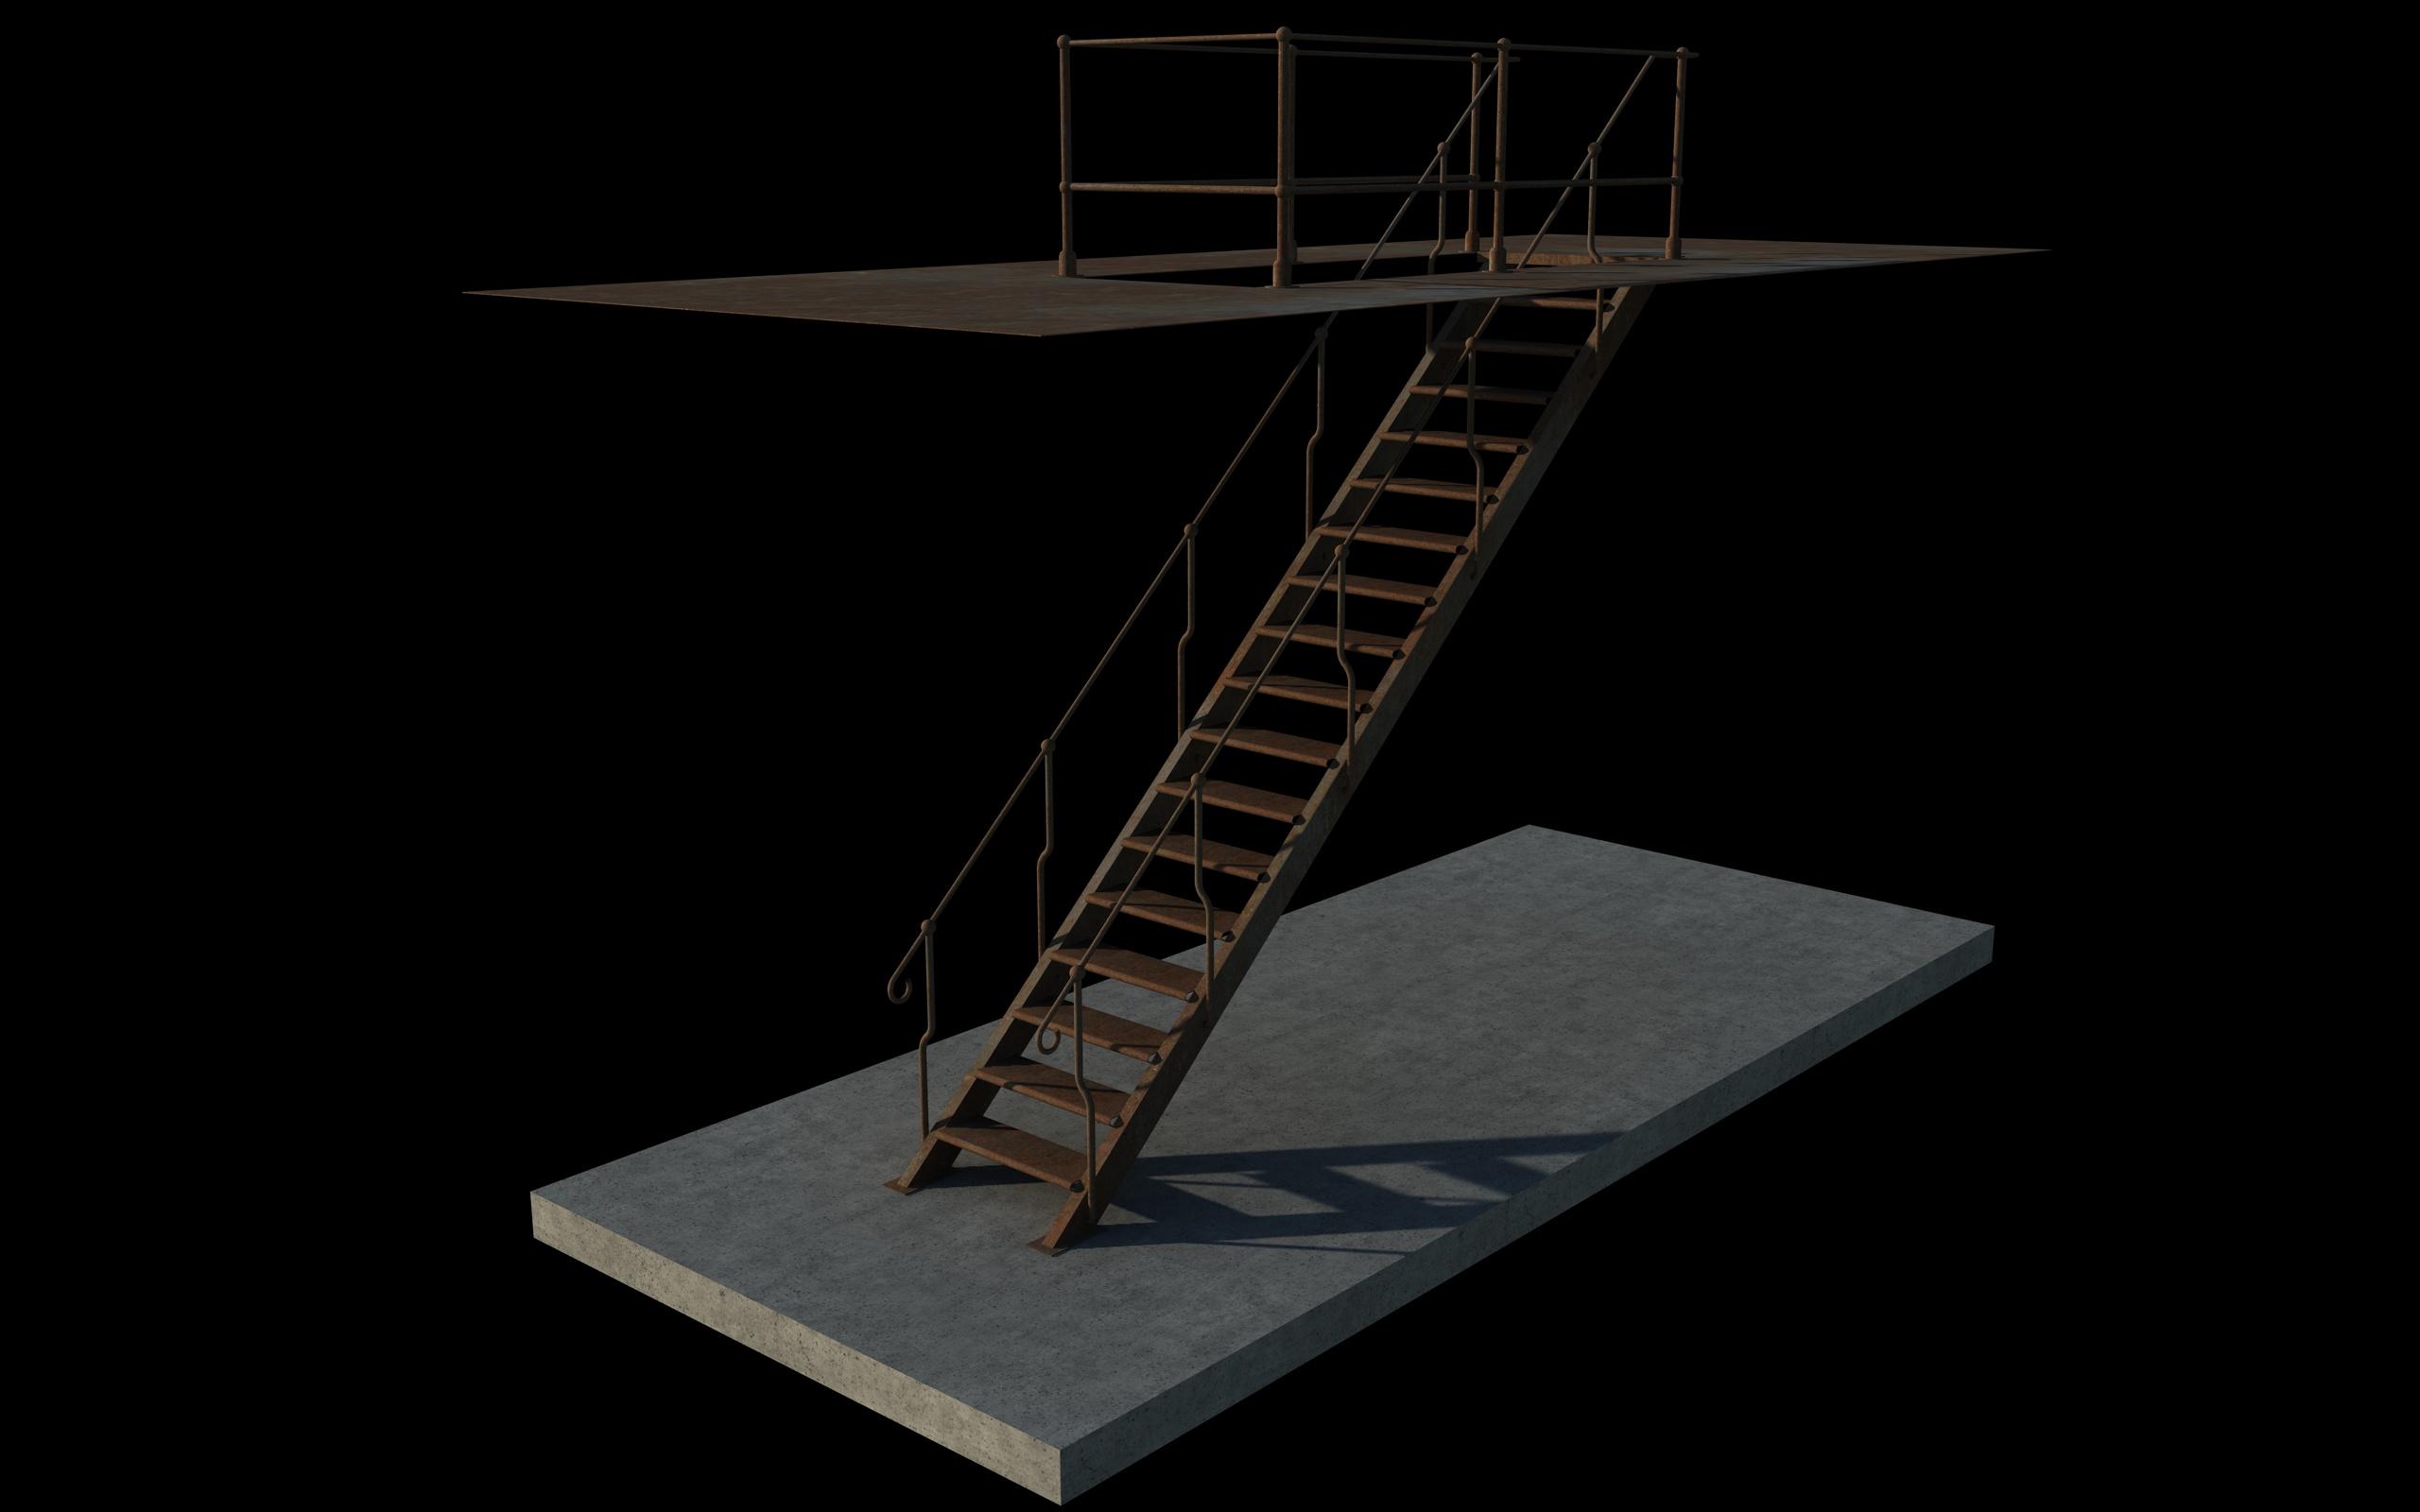 iron stair 3d obj 3d model 3ds dxf c4d skp obj 148388